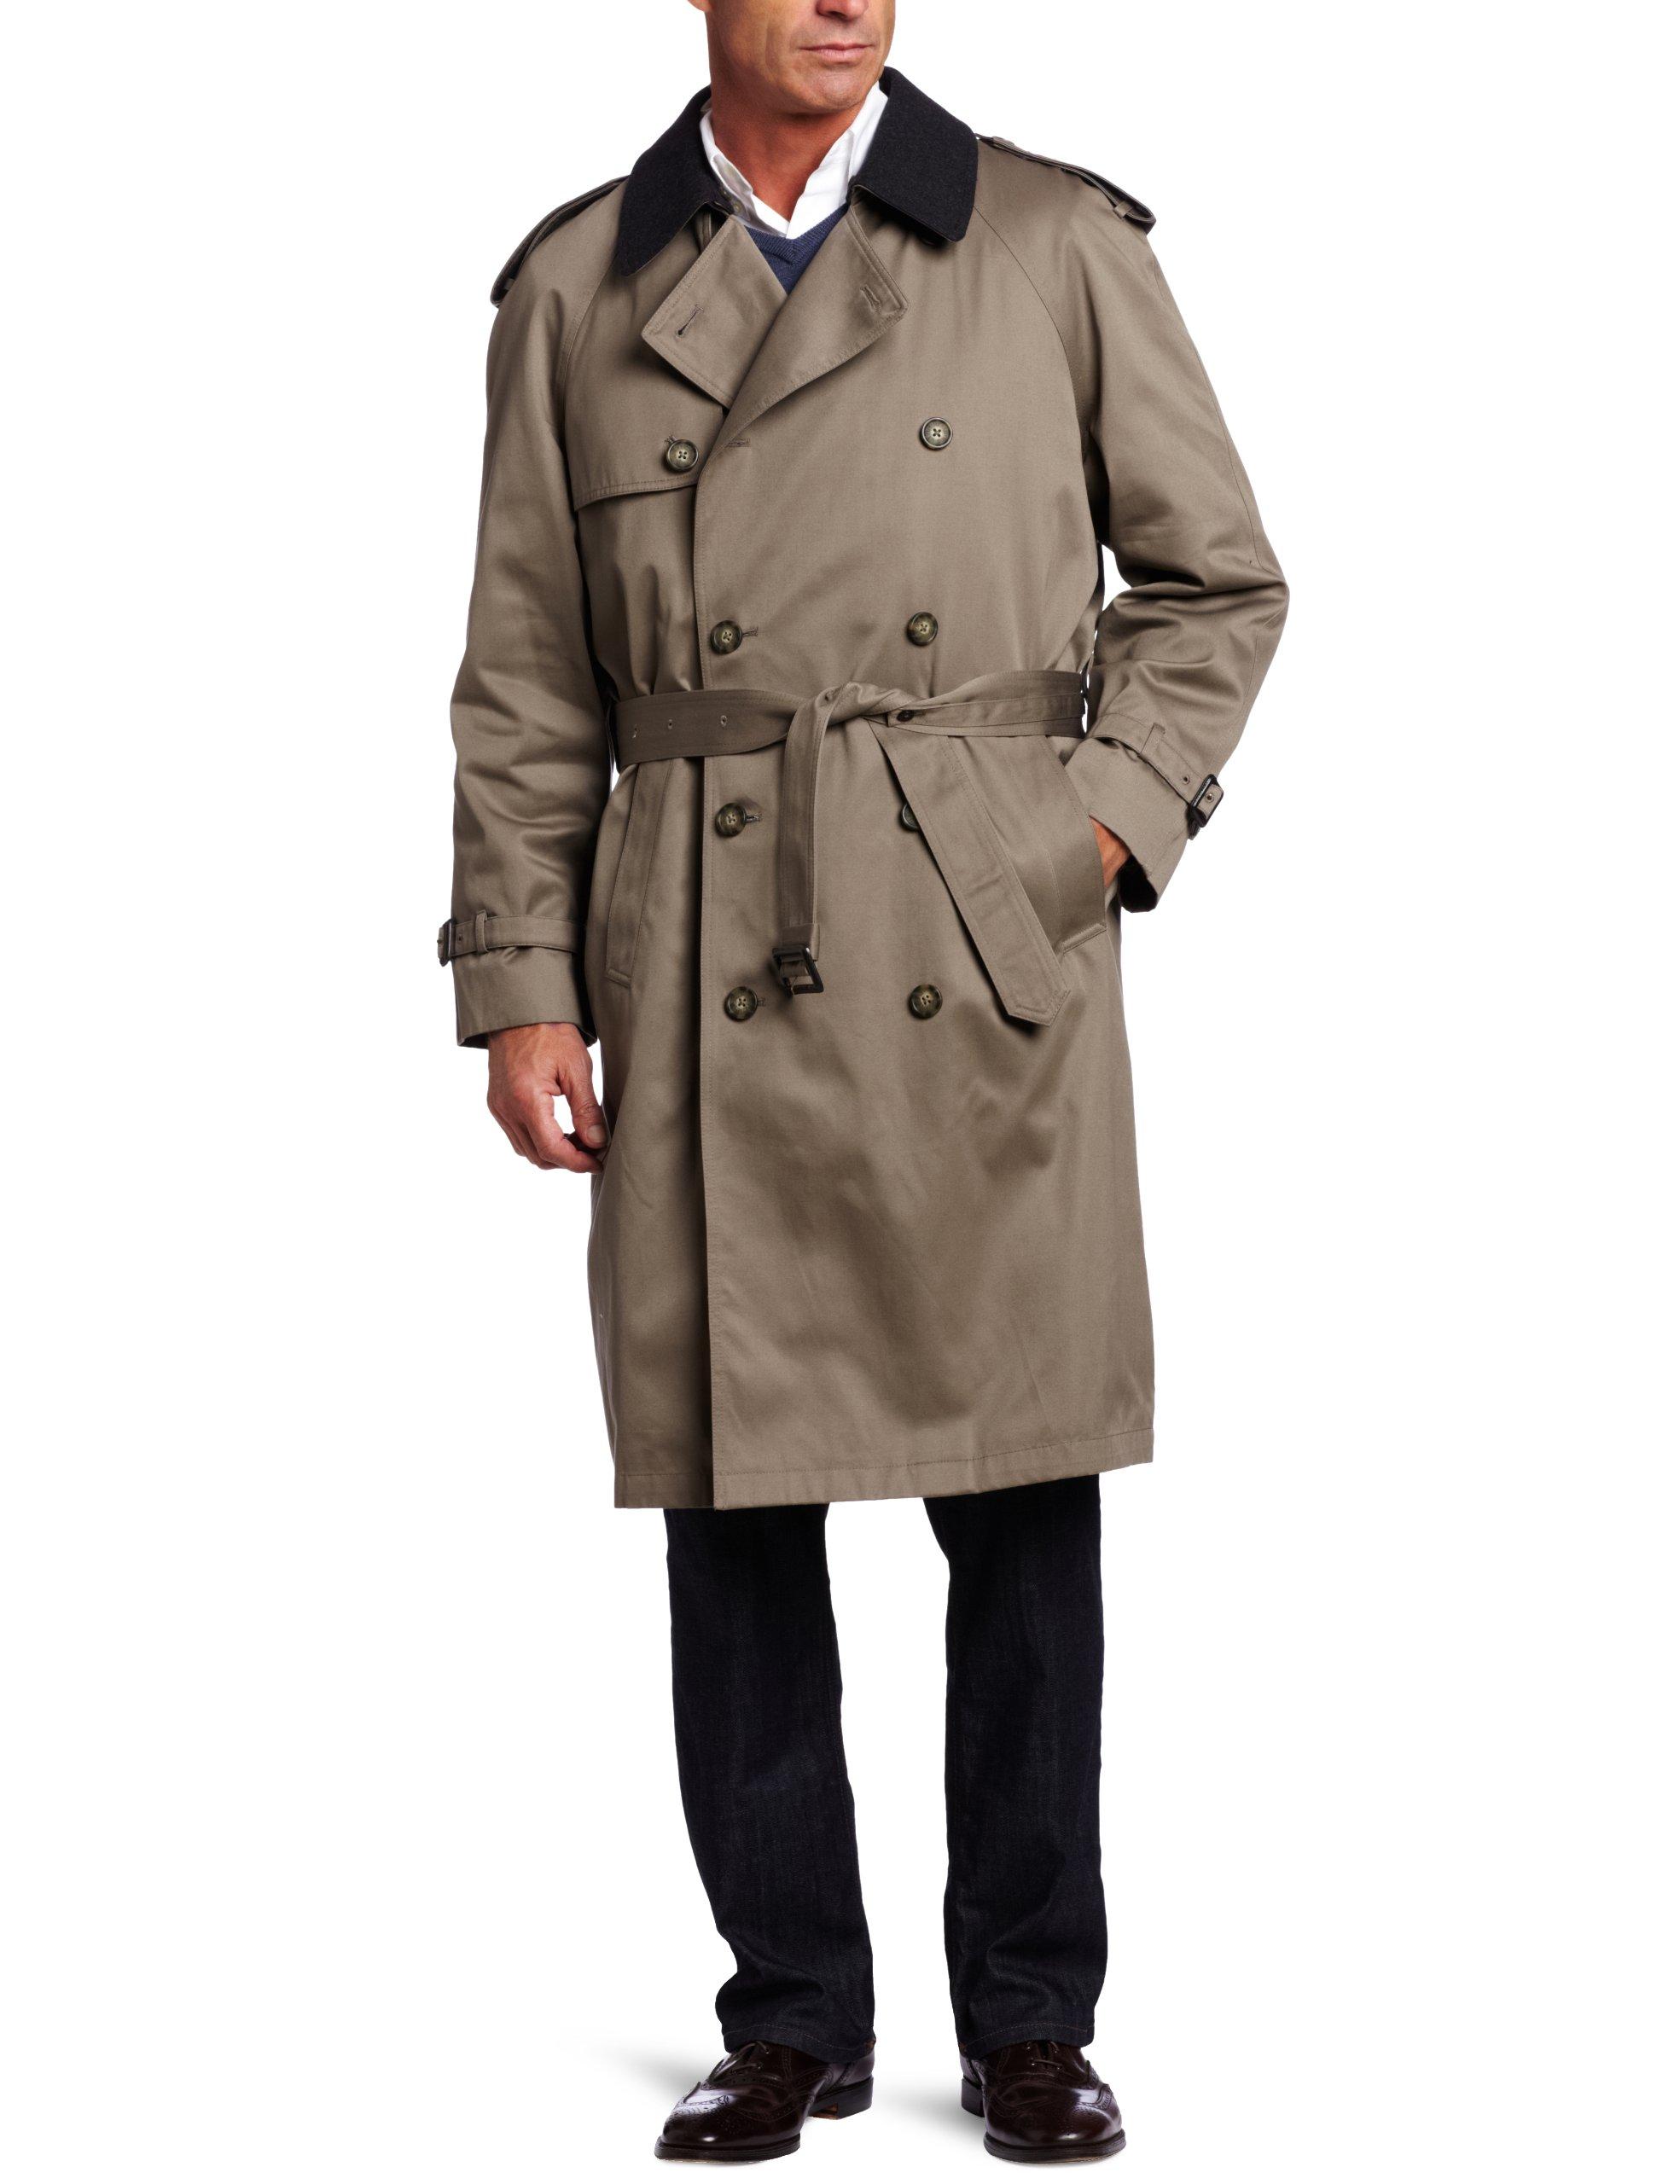 Hart Schaffner Marx Men's Burnett Trench Coat, Loden, 40 Short